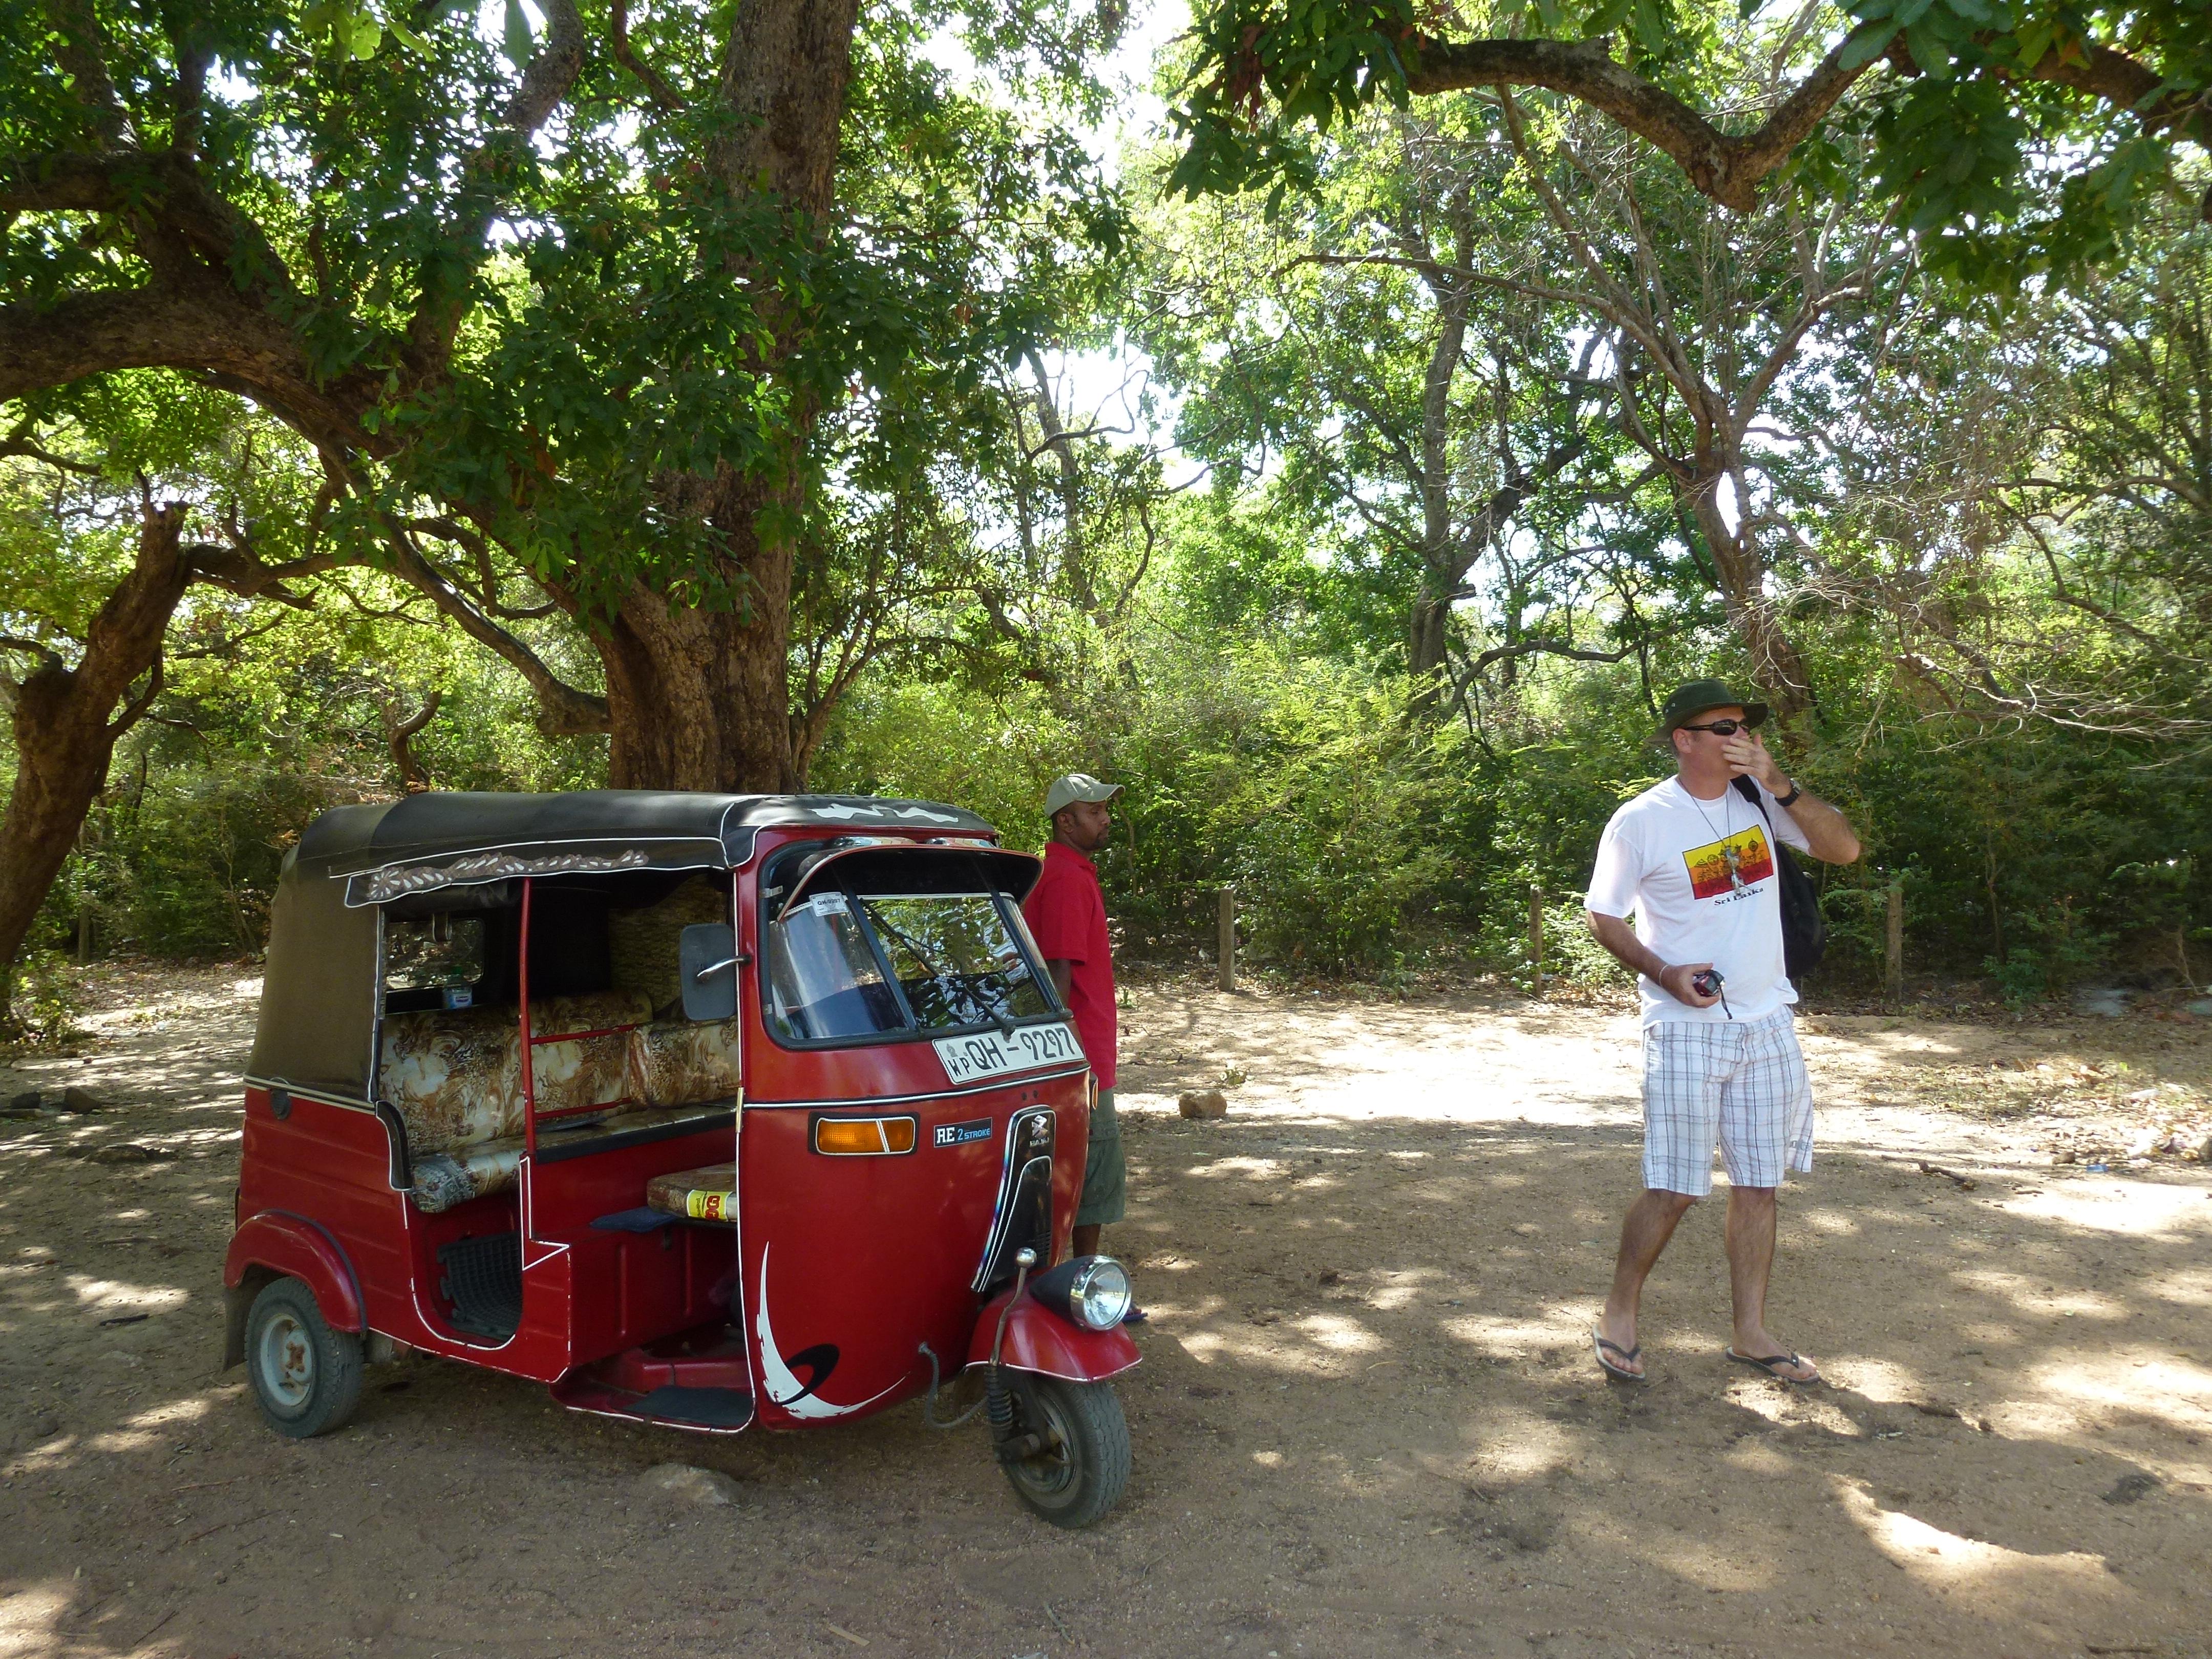 Sairis Car Refueling Long Funnel Oil Additive Motorcycle Farm Machine Funnel Car Refueling Longer Funnel Gasoline Engine Orange